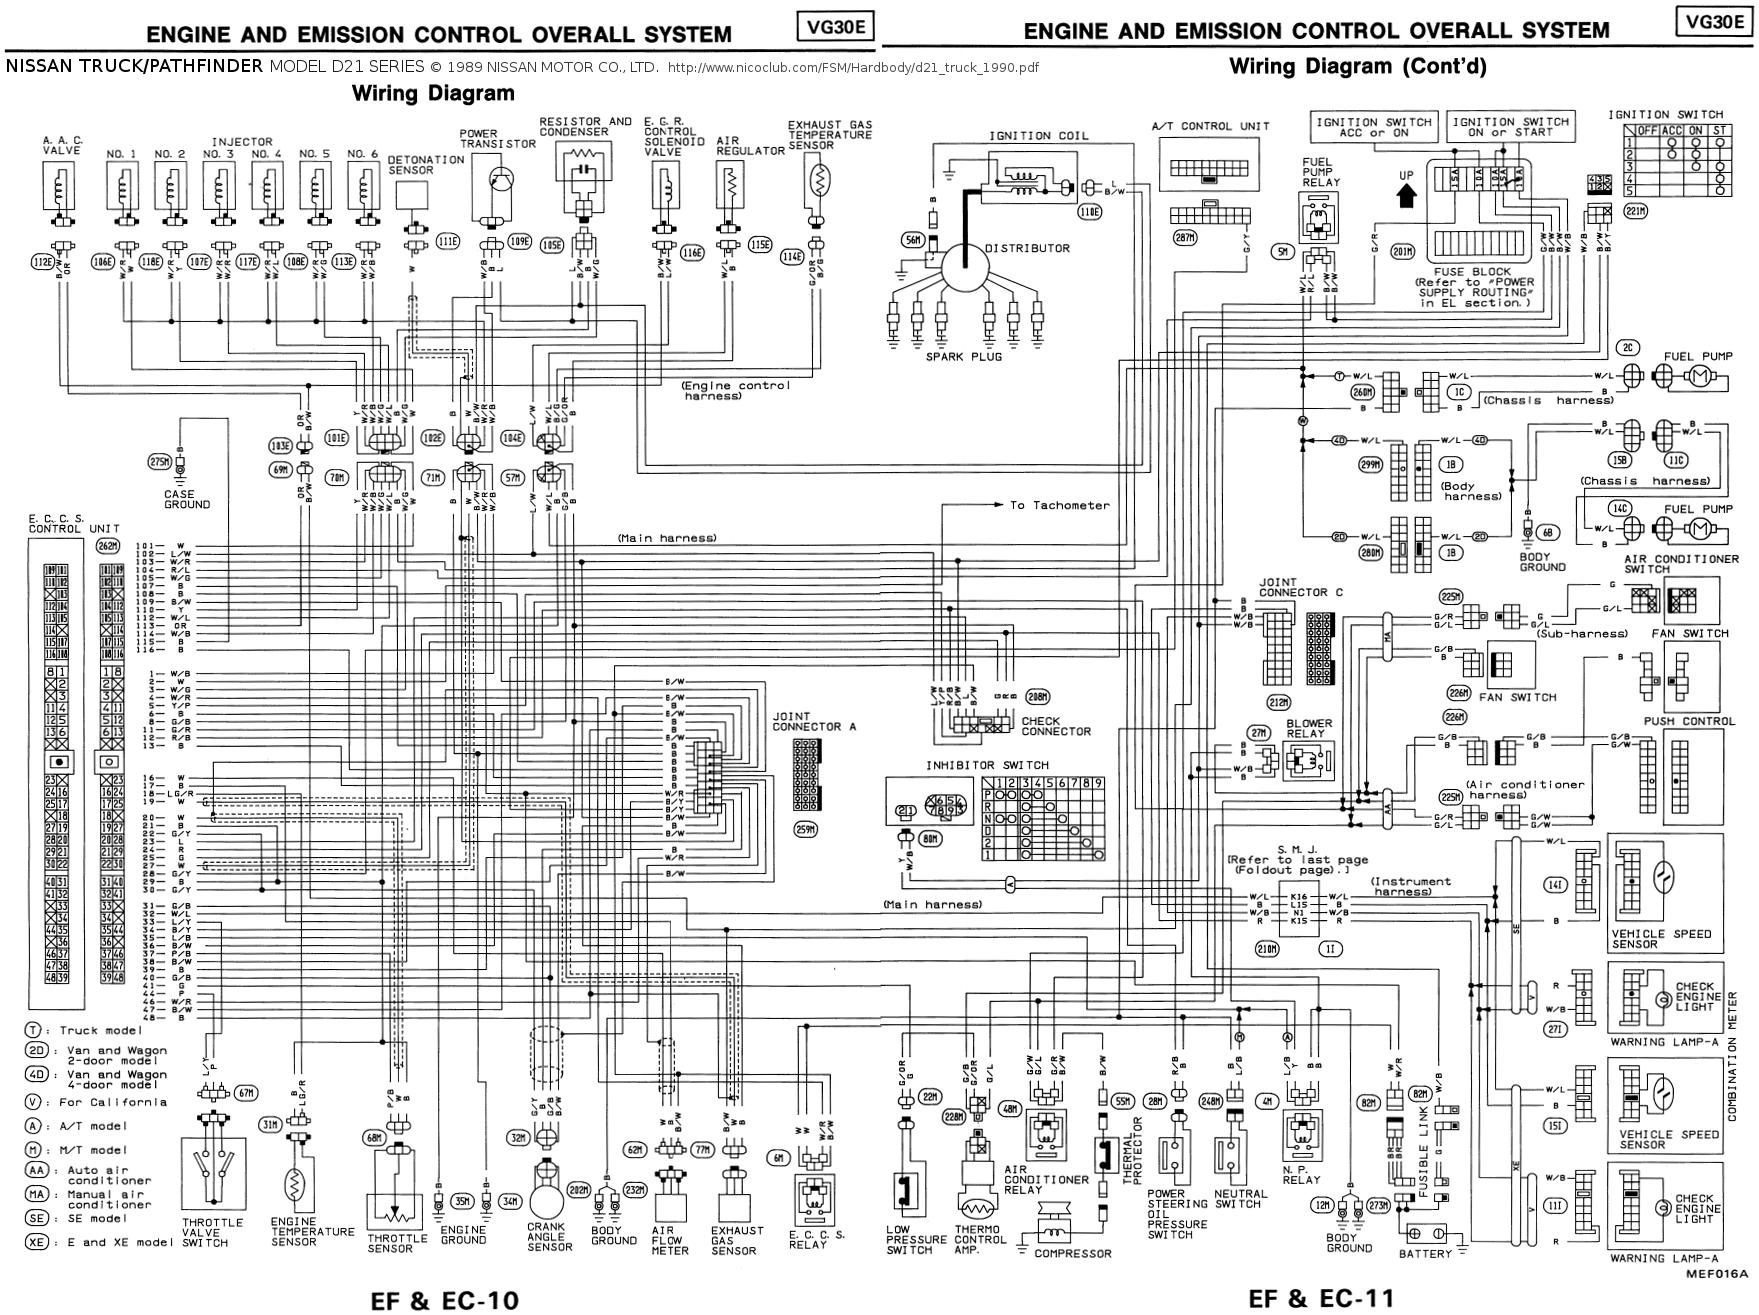 87 nissan d21 wiring diagram - wiring ddiagrams home drop-normal -  drop-normal.brixiaproart.it  brixia pro art